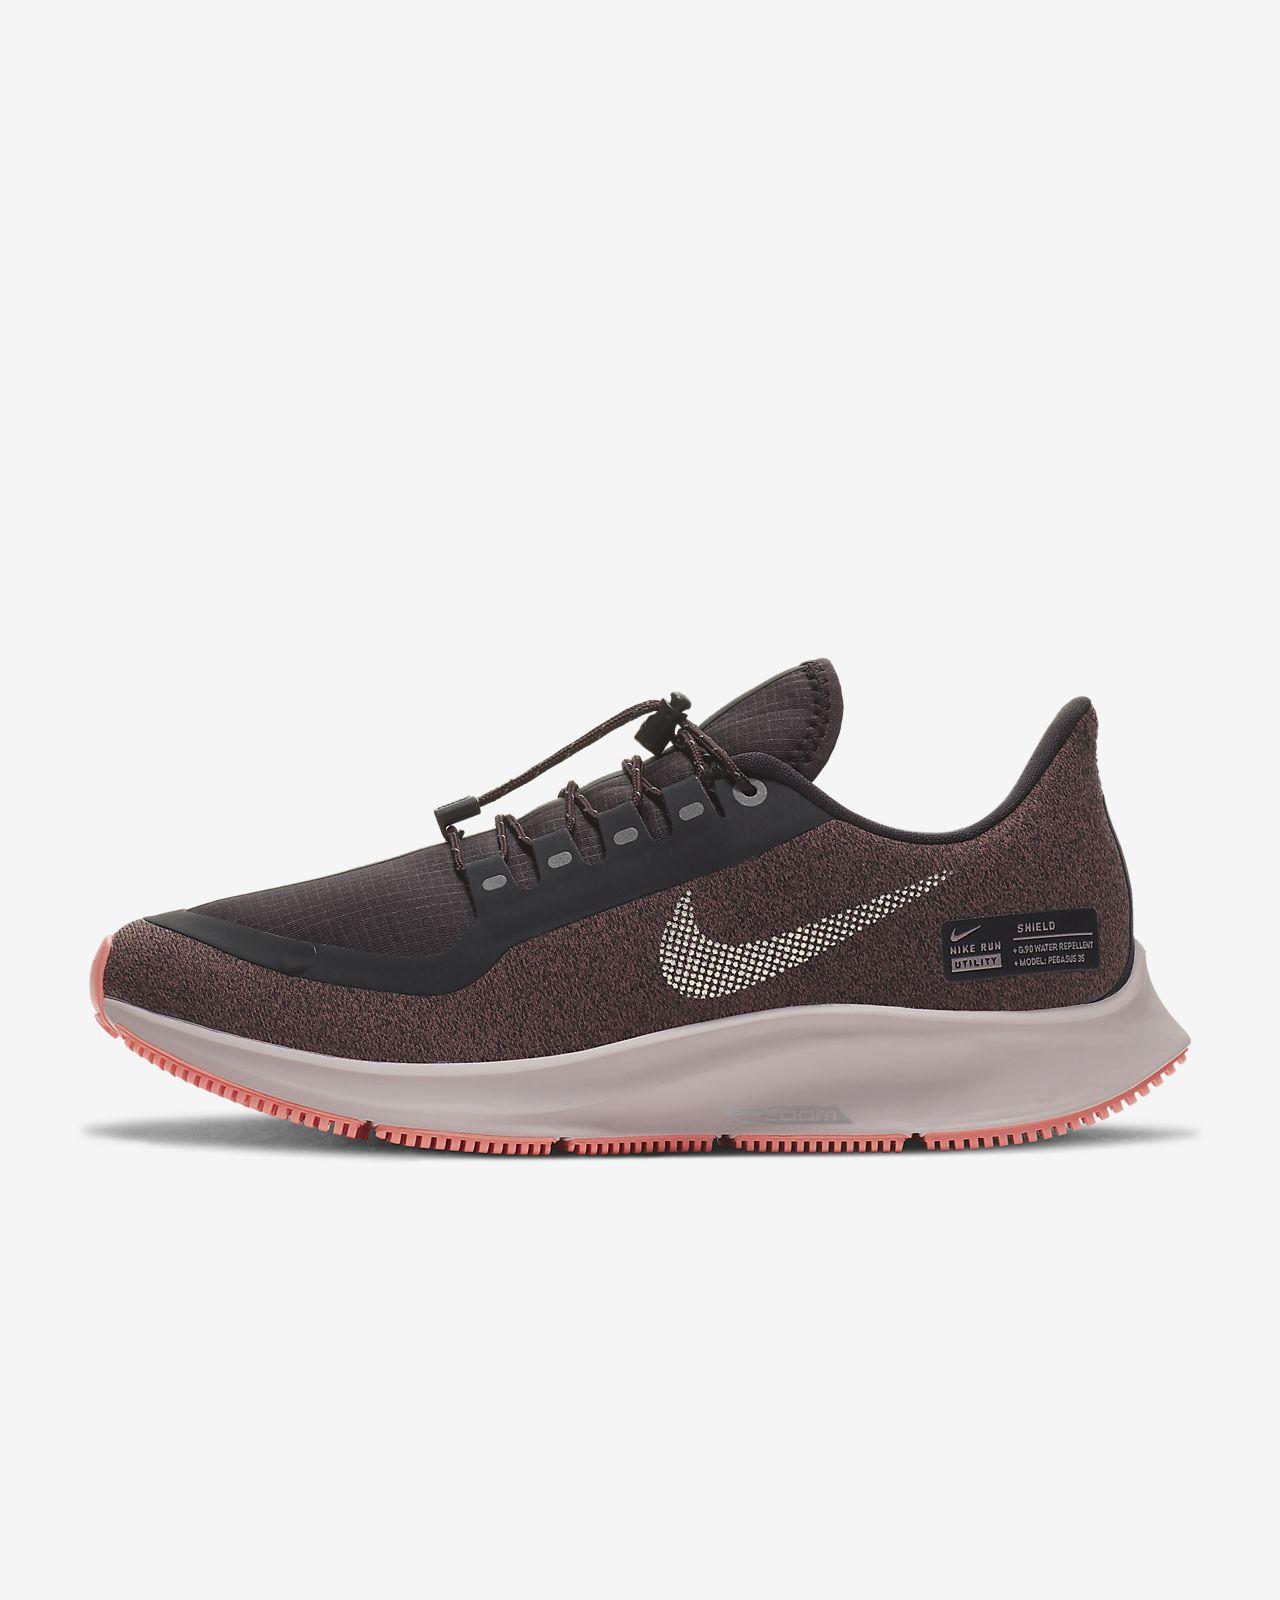 buy popular ae3a2 460da ... Chaussure de running Nike Air Zoom Pegasus 35 Shield Water-Repellent  pour Femme